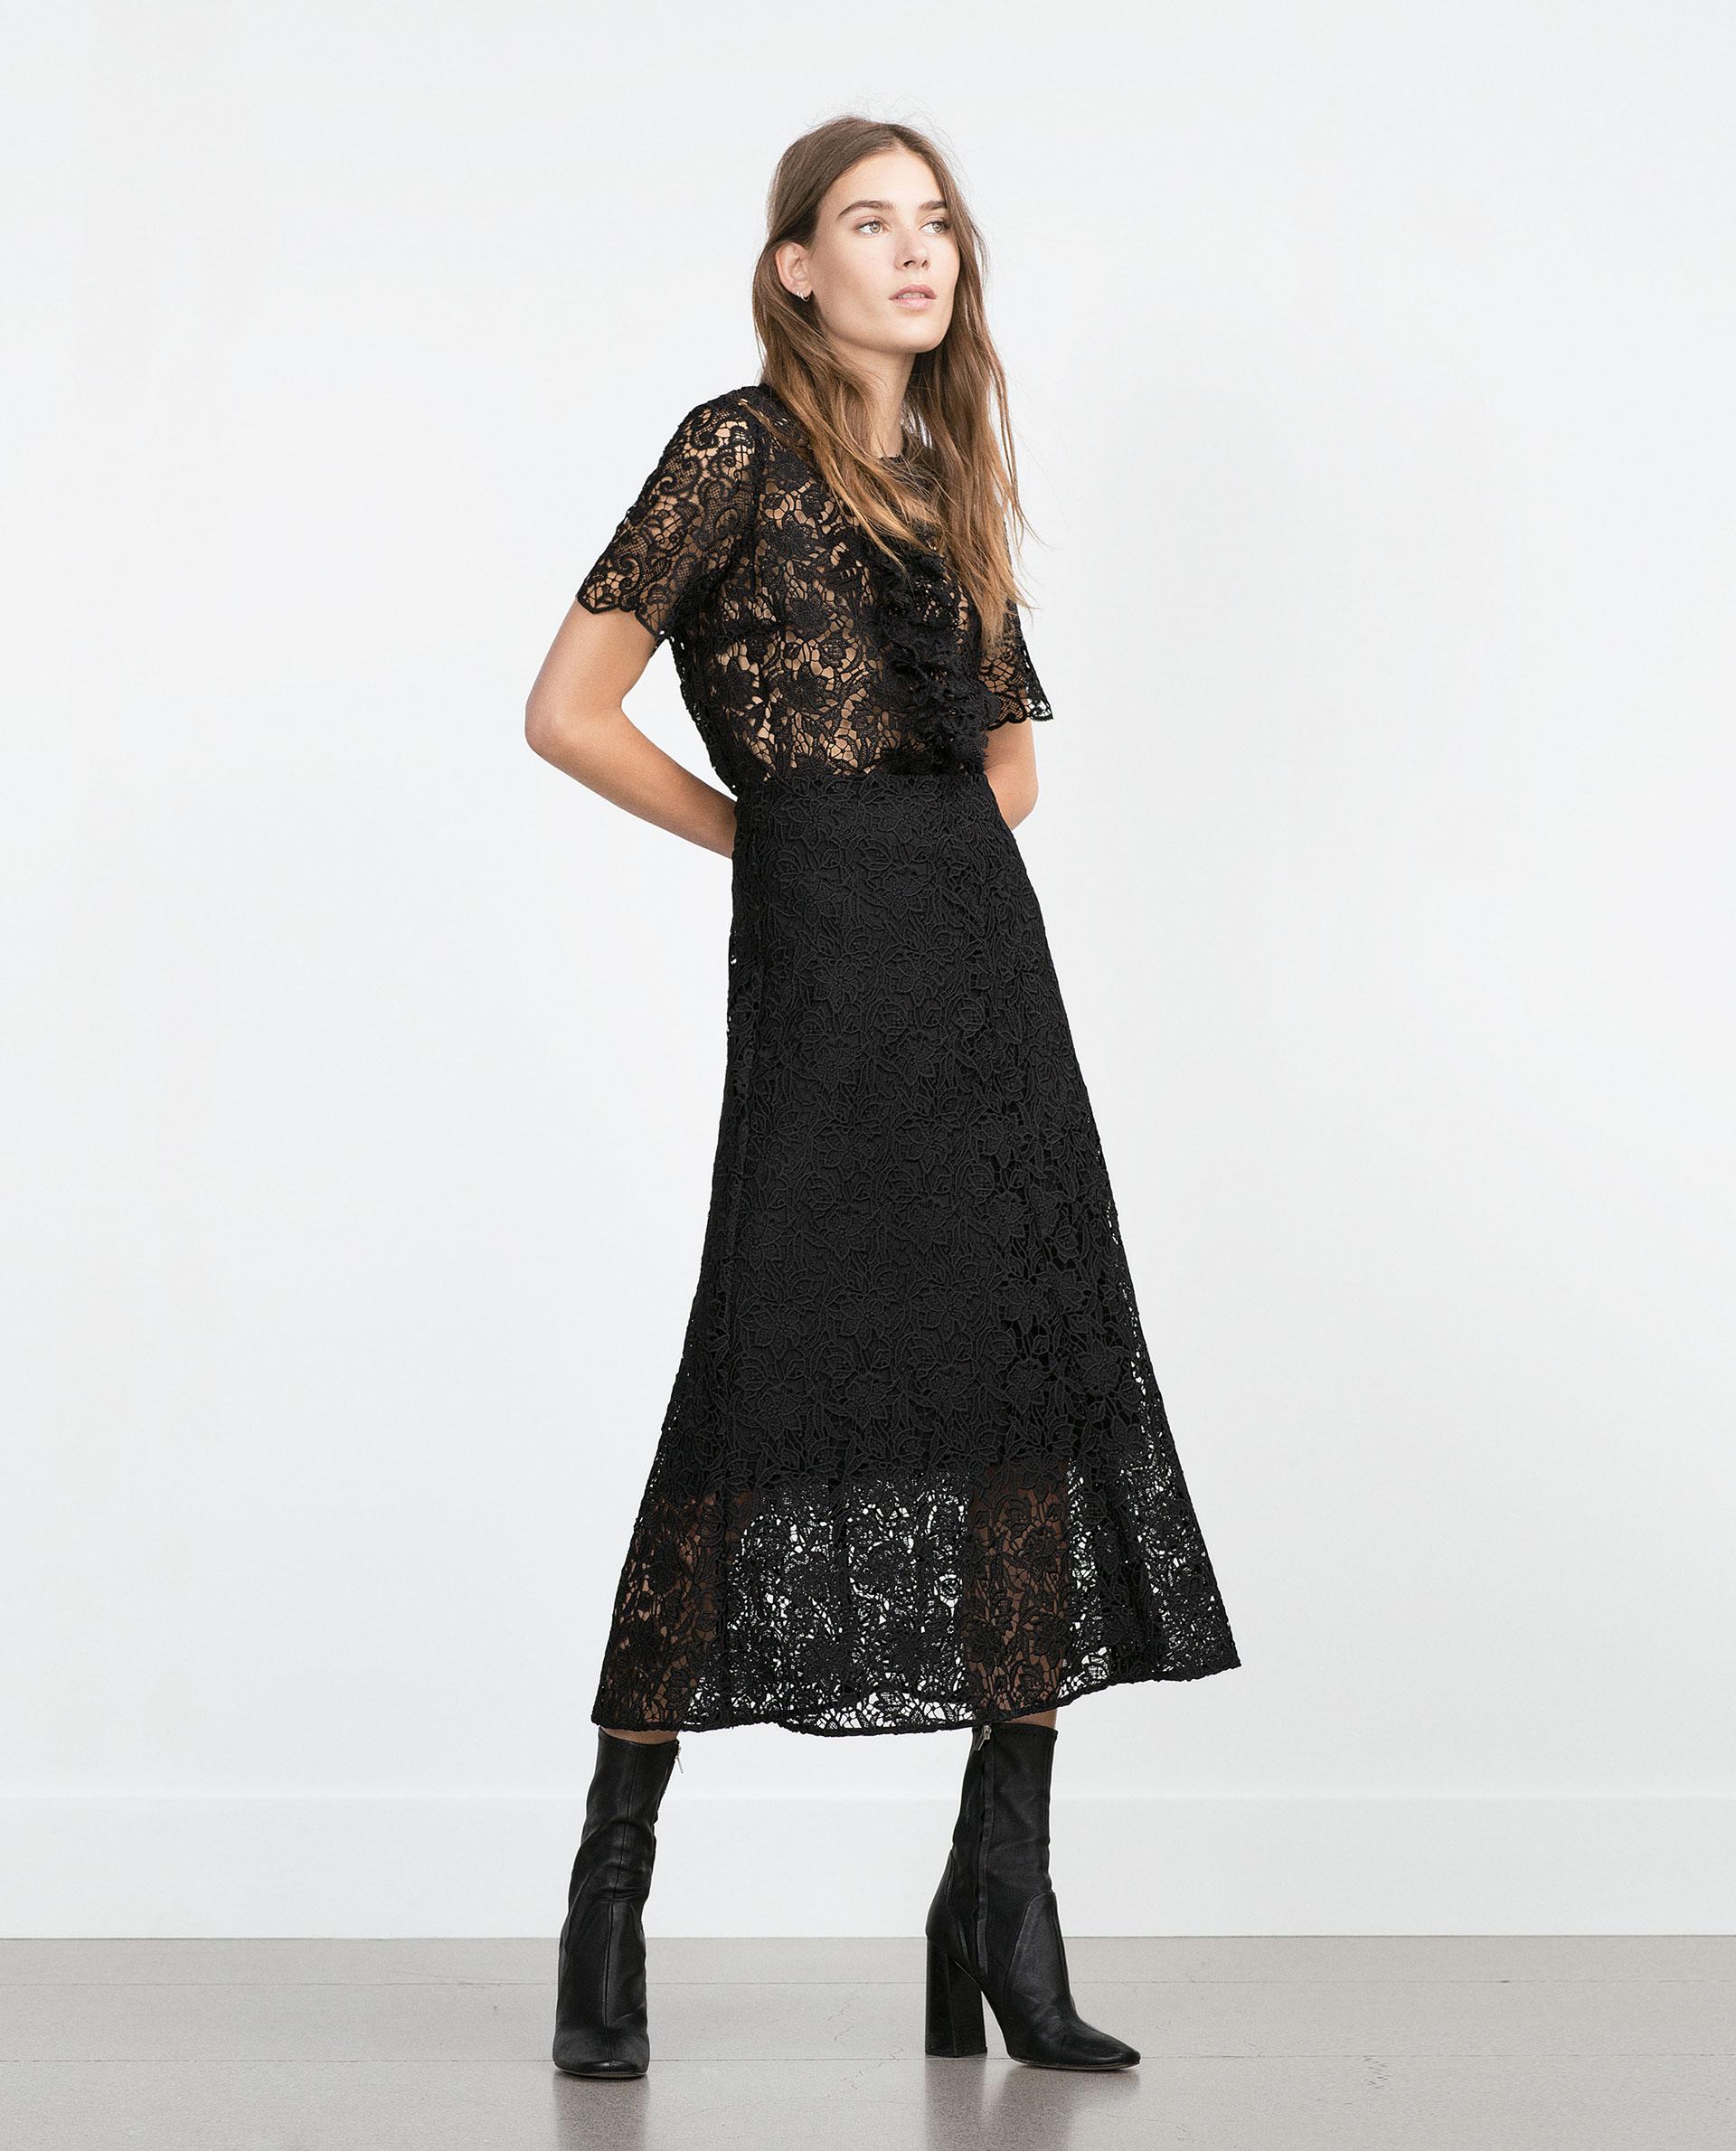 Zara Midi Length Lace Skirt in Black | Lyst